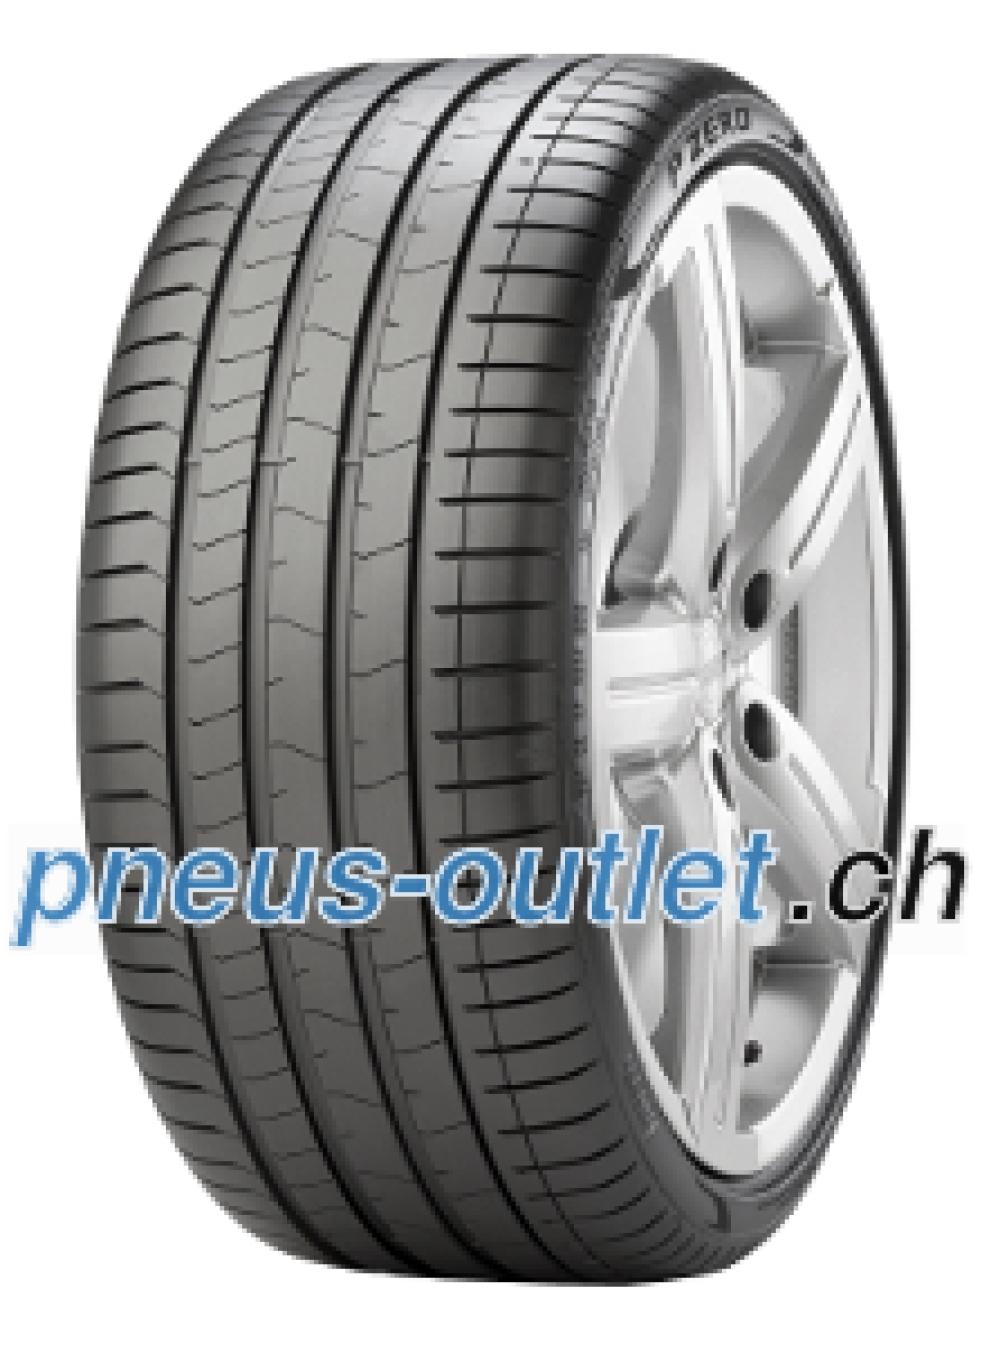 Pirelli P Zero LS runflat ( 245/35 R20 95Y XL *, MOE, runflat )